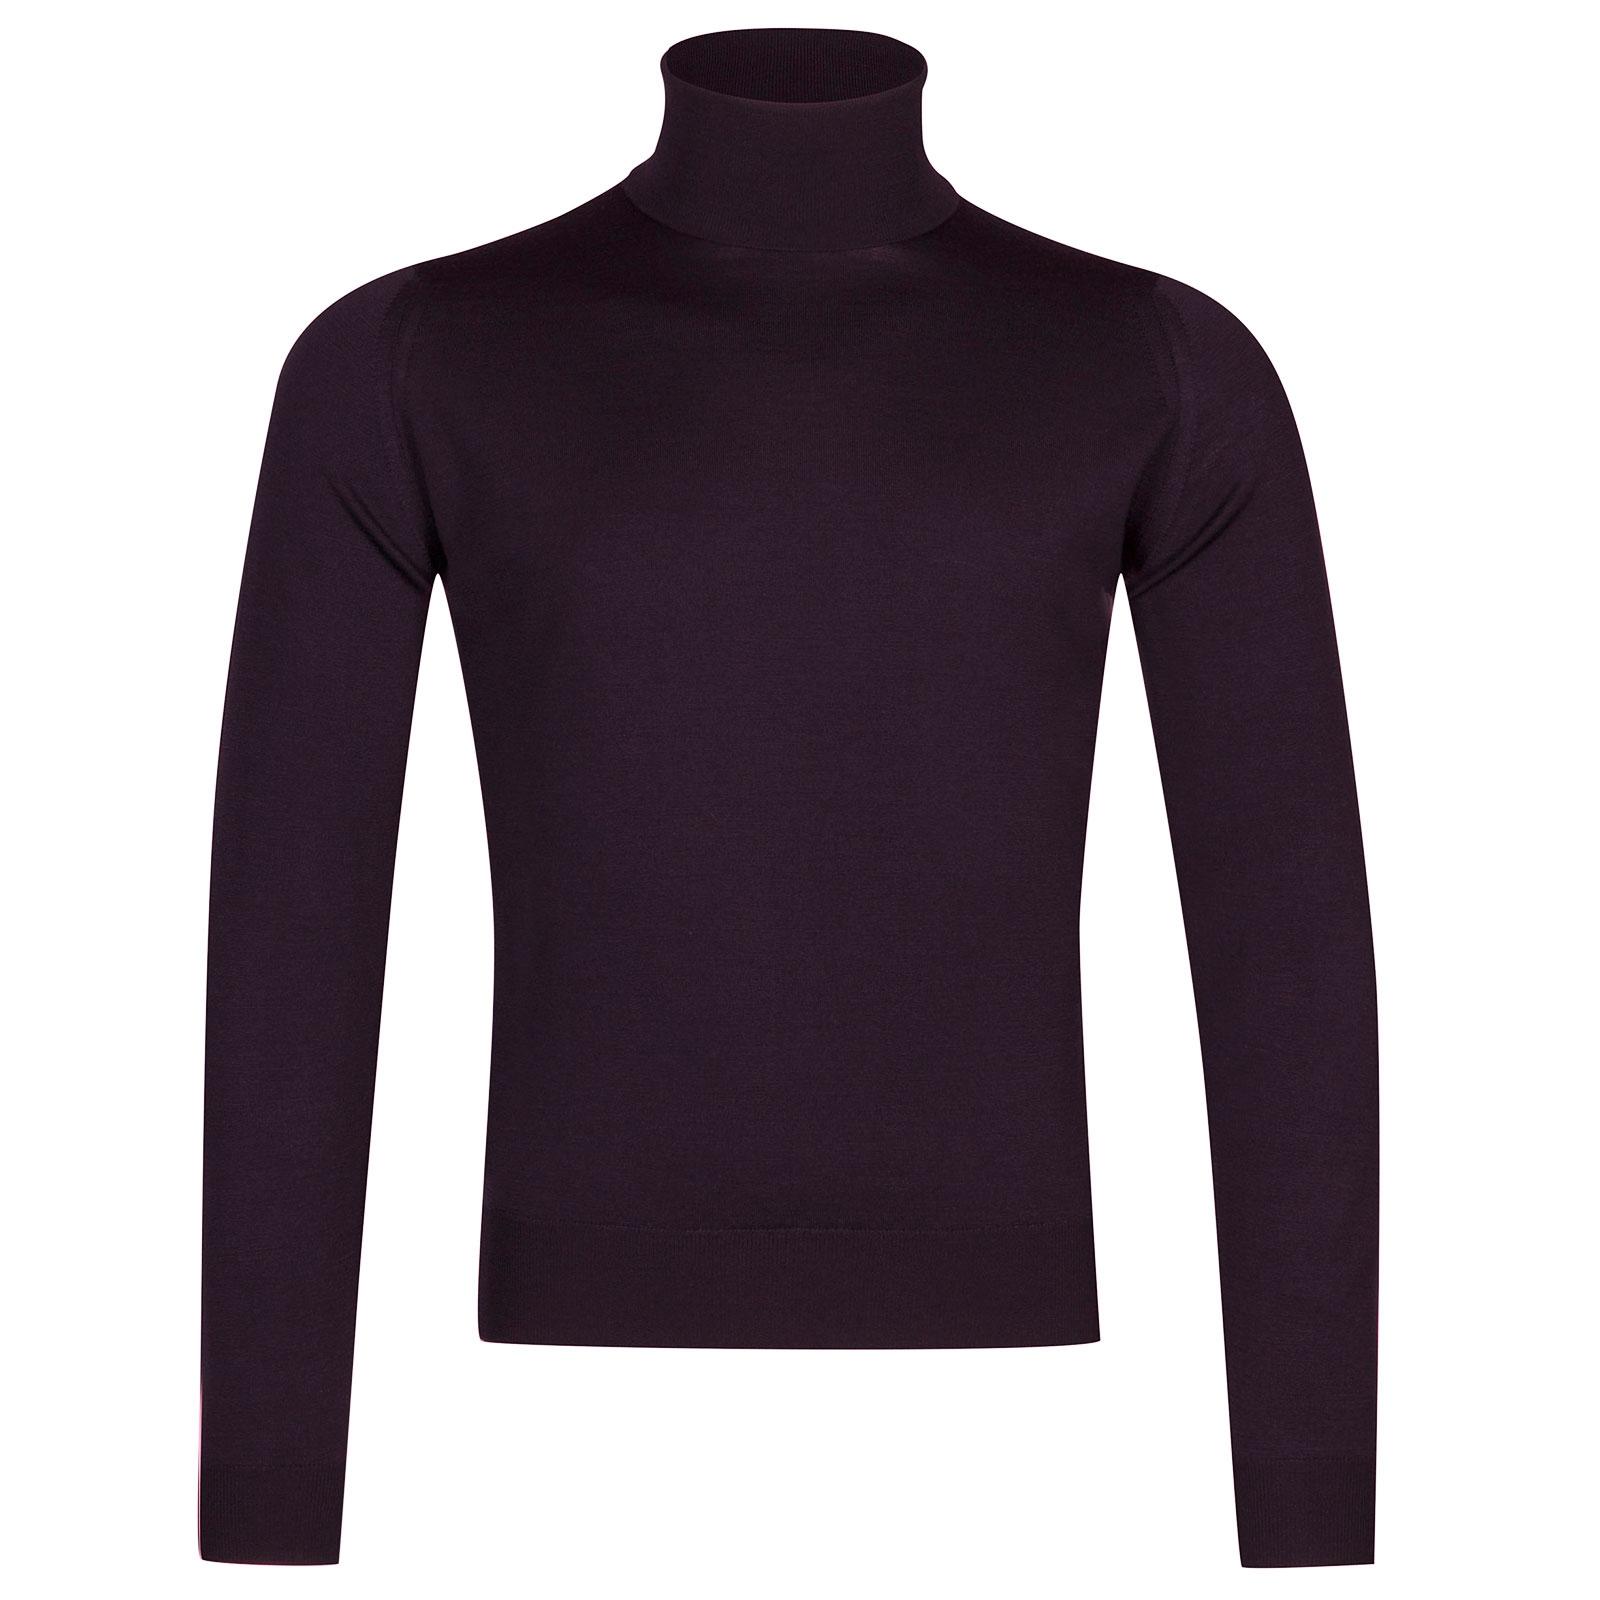 John Smedley Orta Merino Wool Pullover in Mystic Purple-XXL